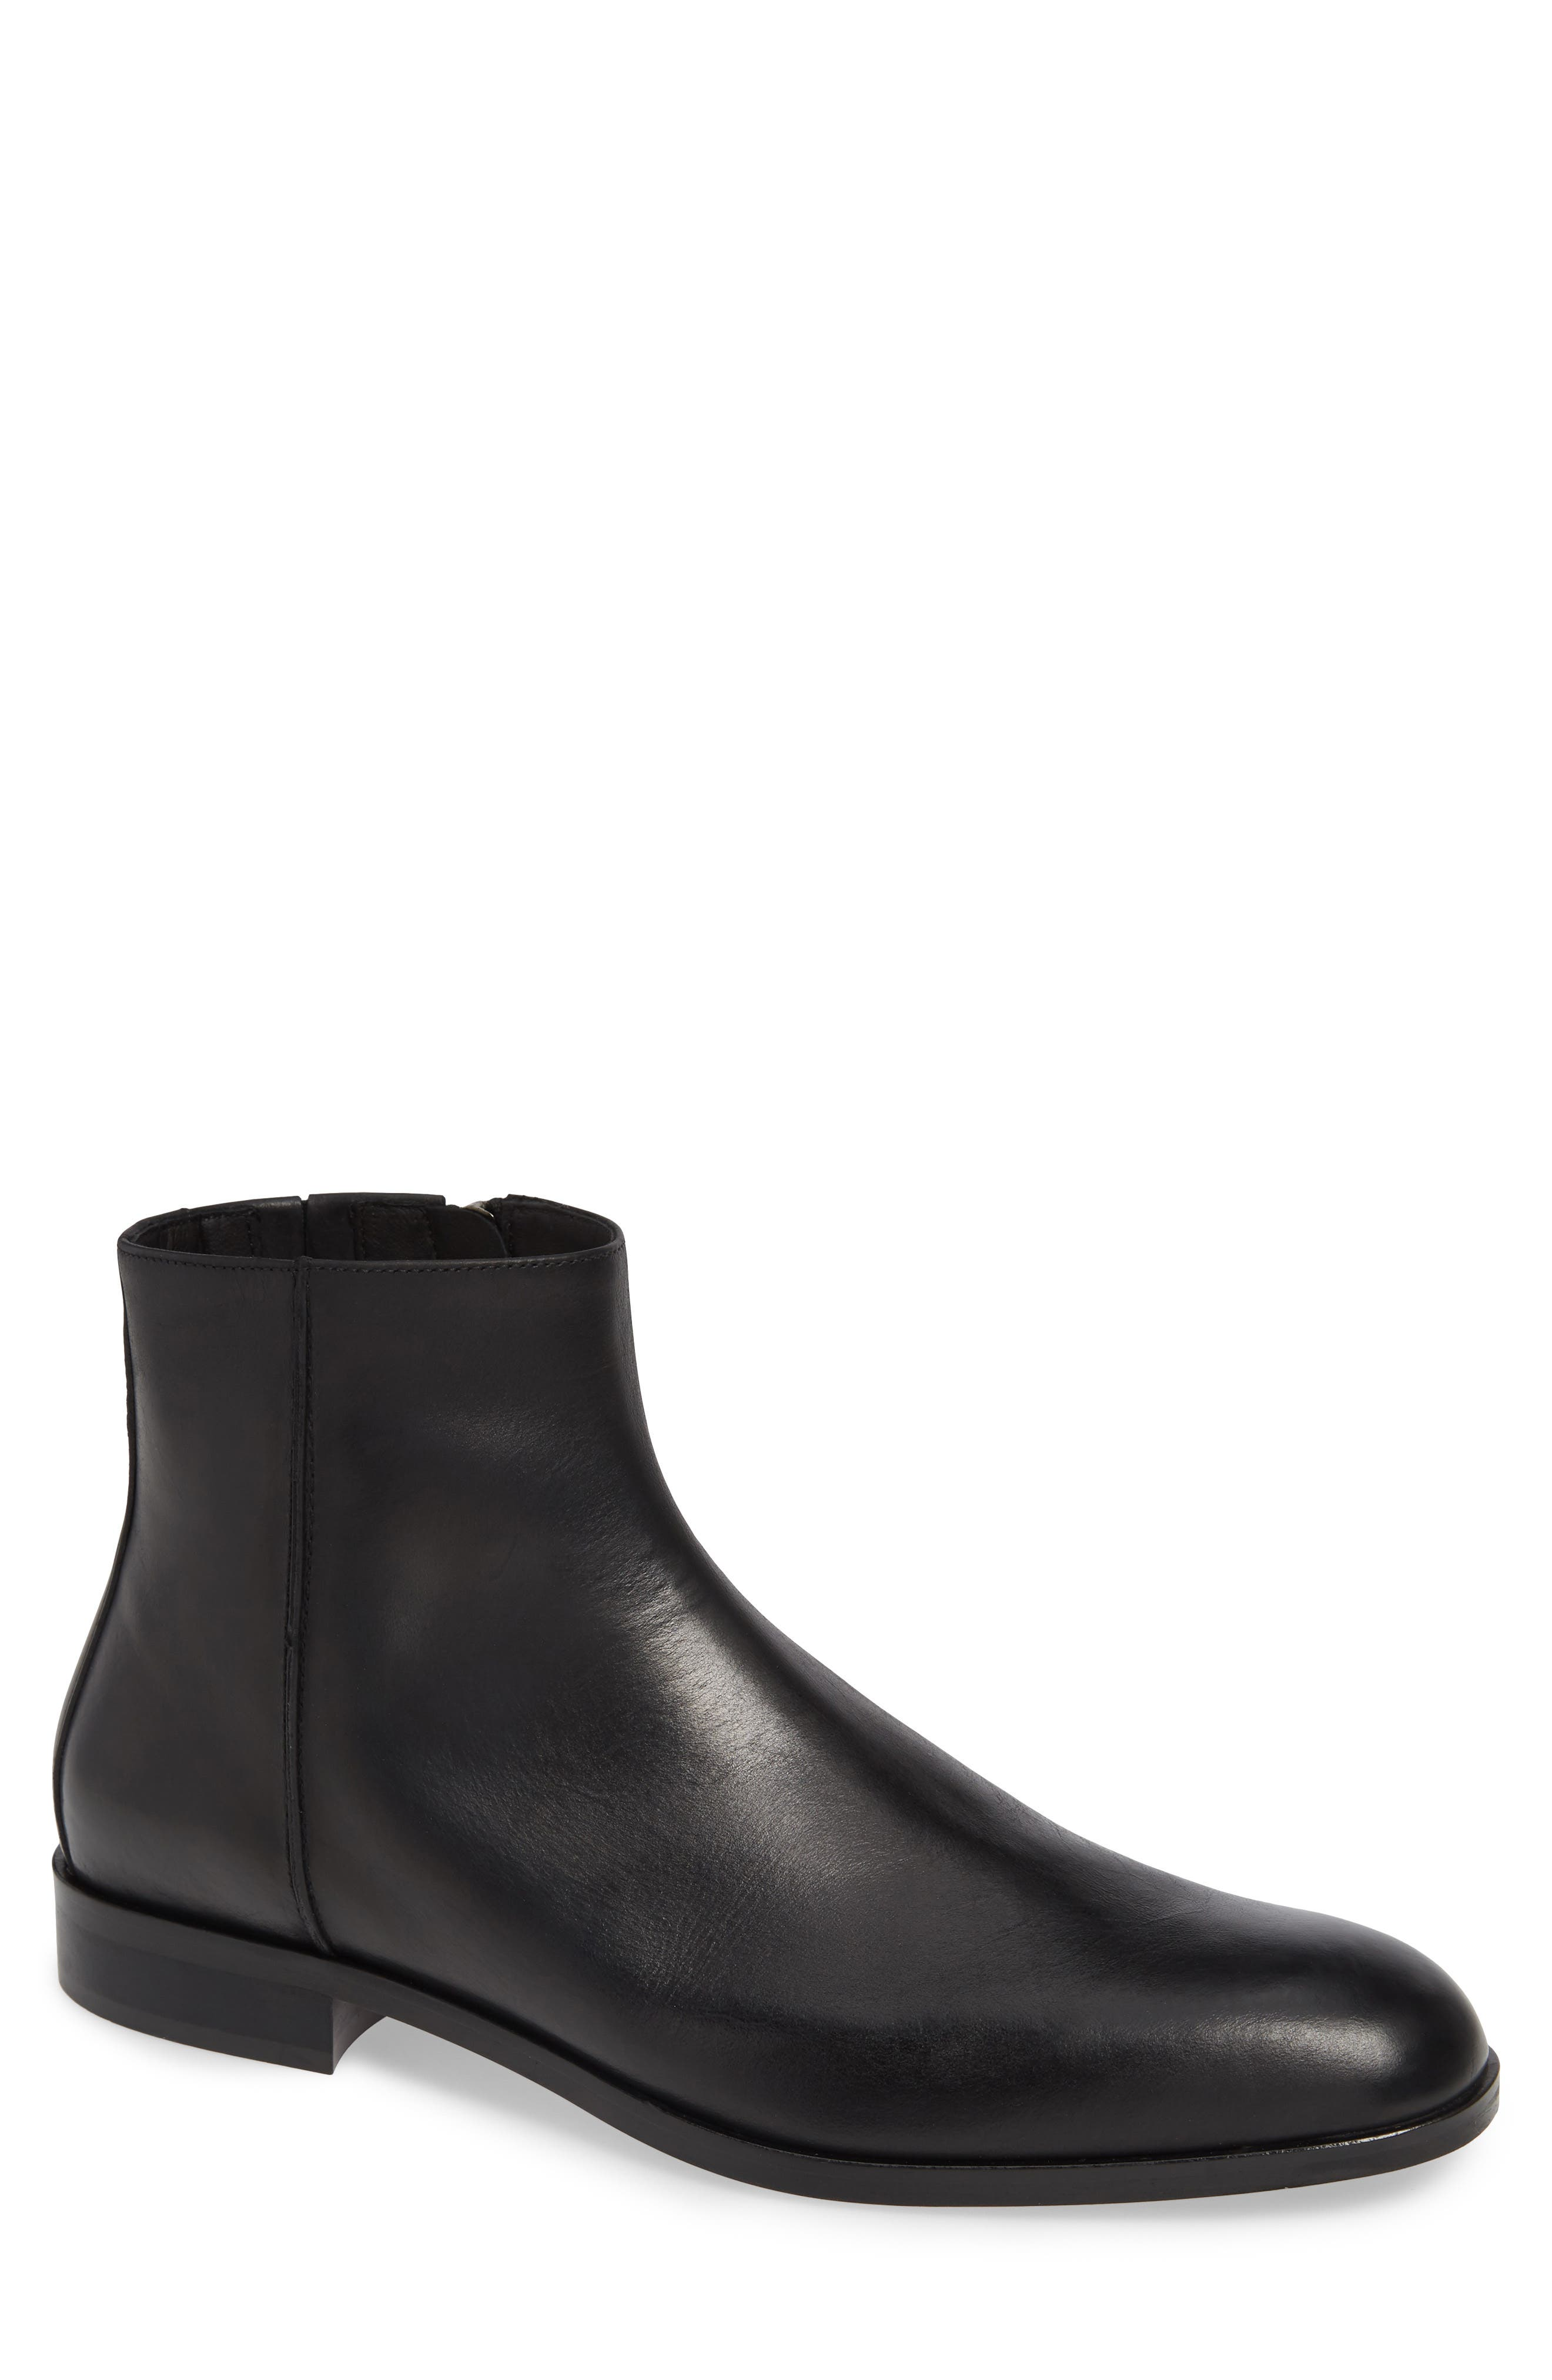 DONALD PLINER Men'S Milo-13 Leather Zip Ankle Boots in Black